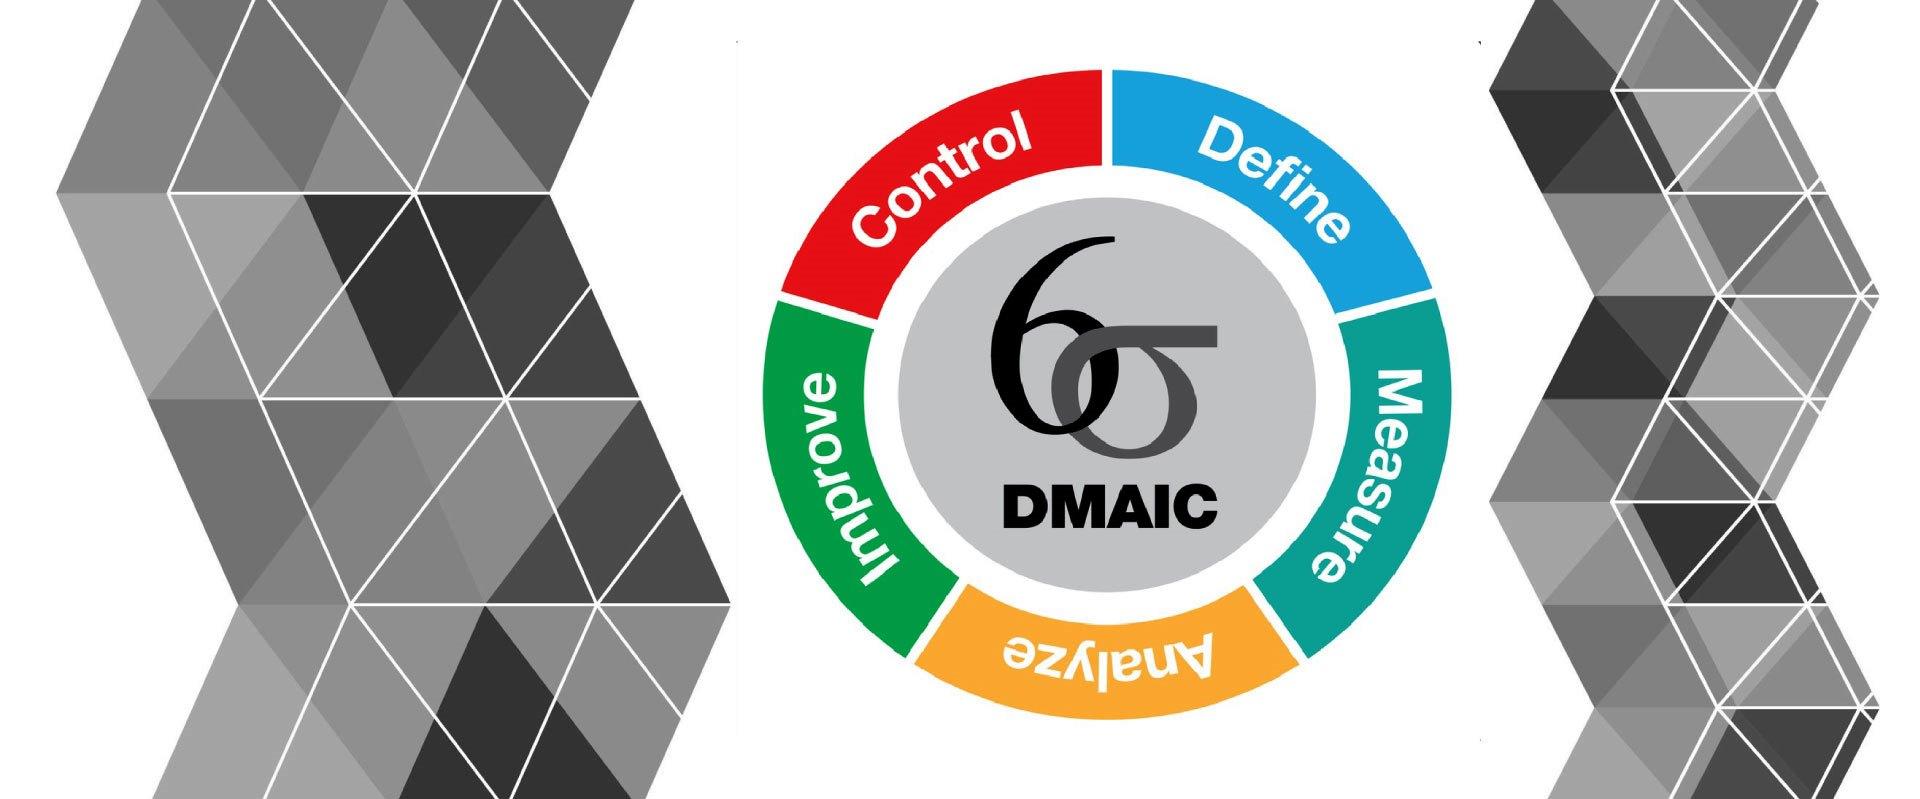 Lean Six Sigma Black Belt Iassc Certified